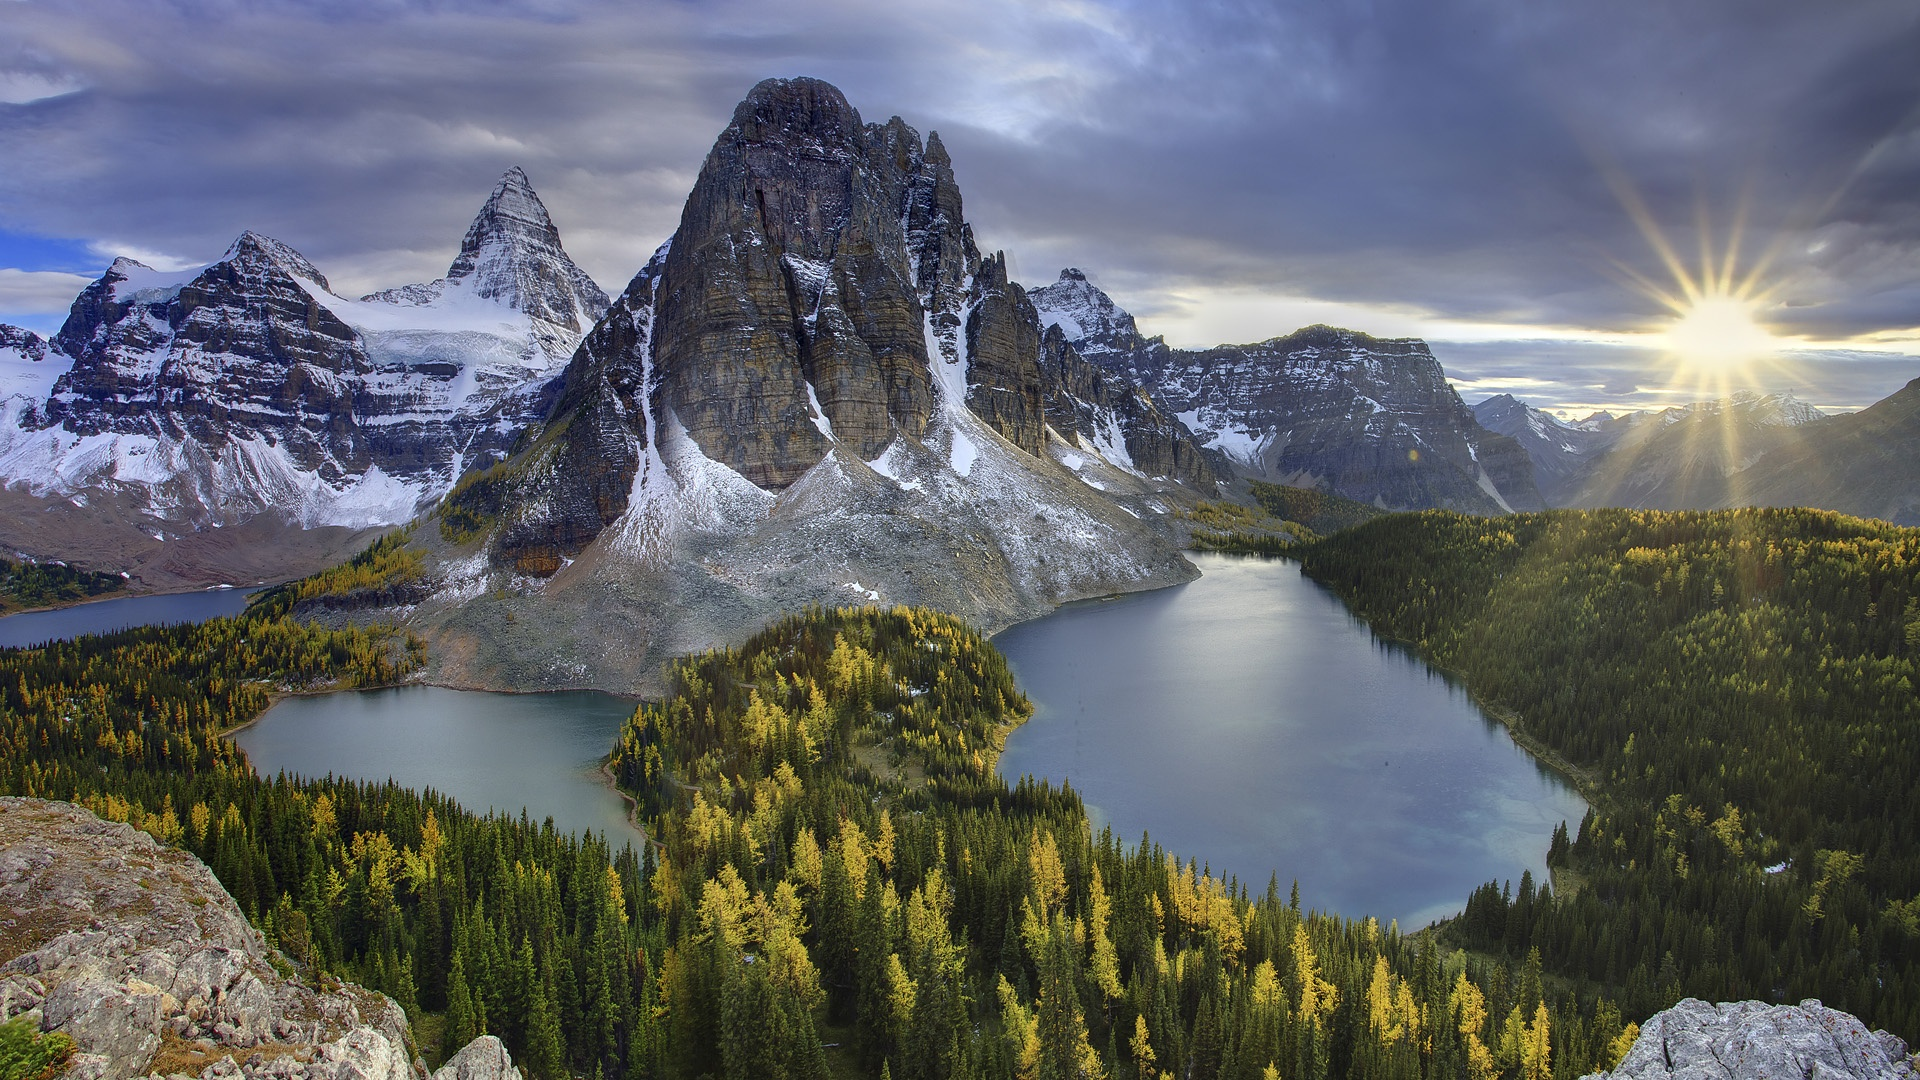 world beautiful landscape wallpapers 1920x1080 1002705